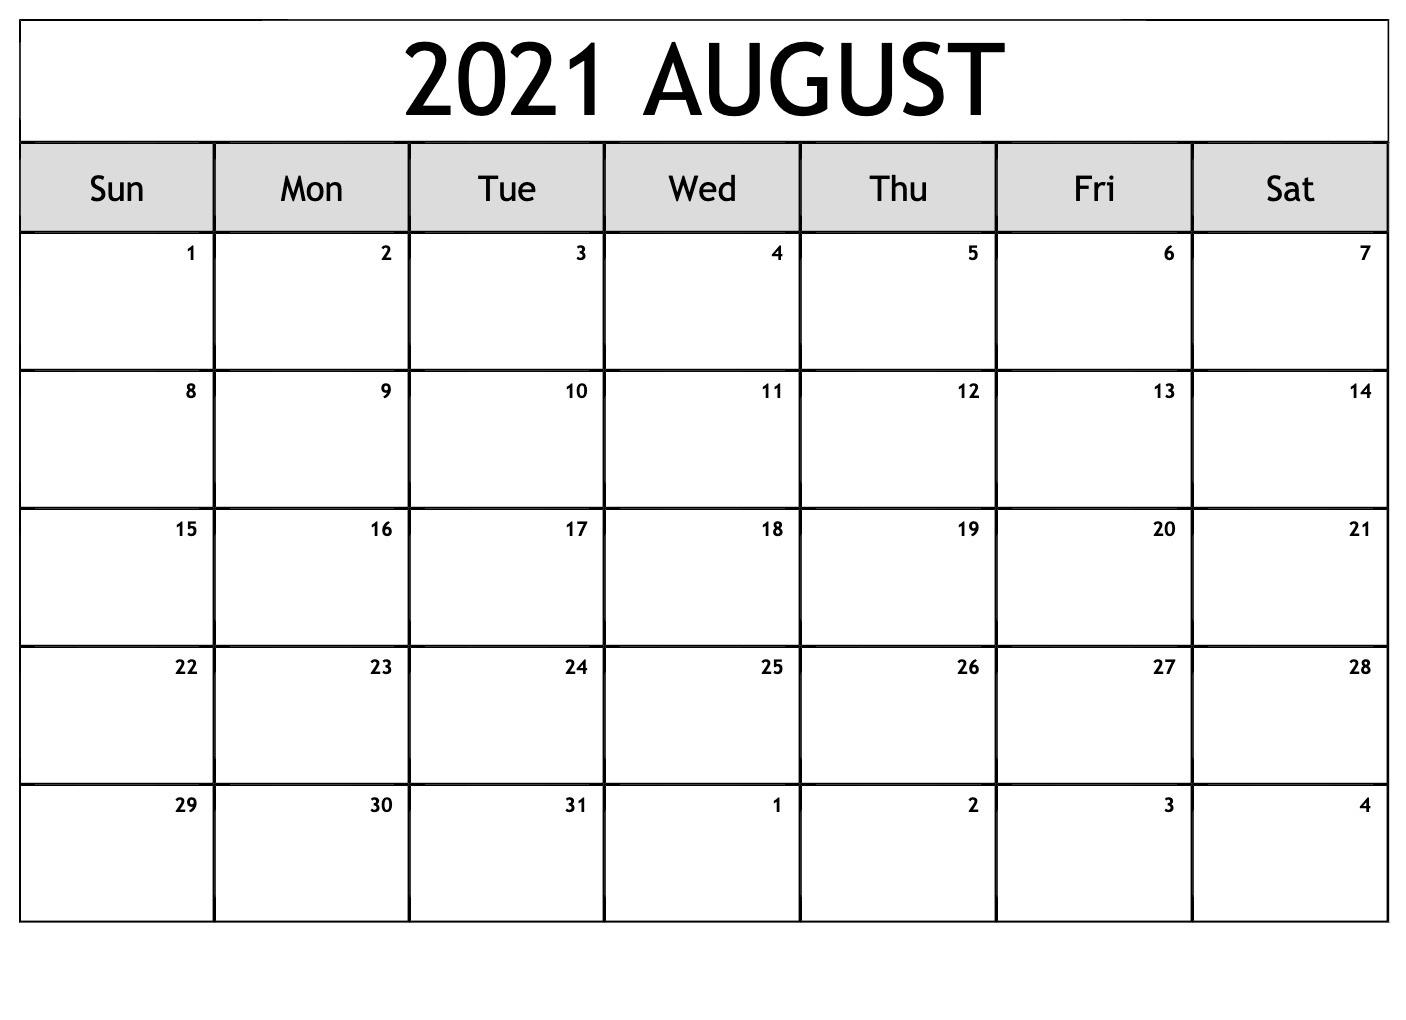 August 2021 Calendar With Holidays USA